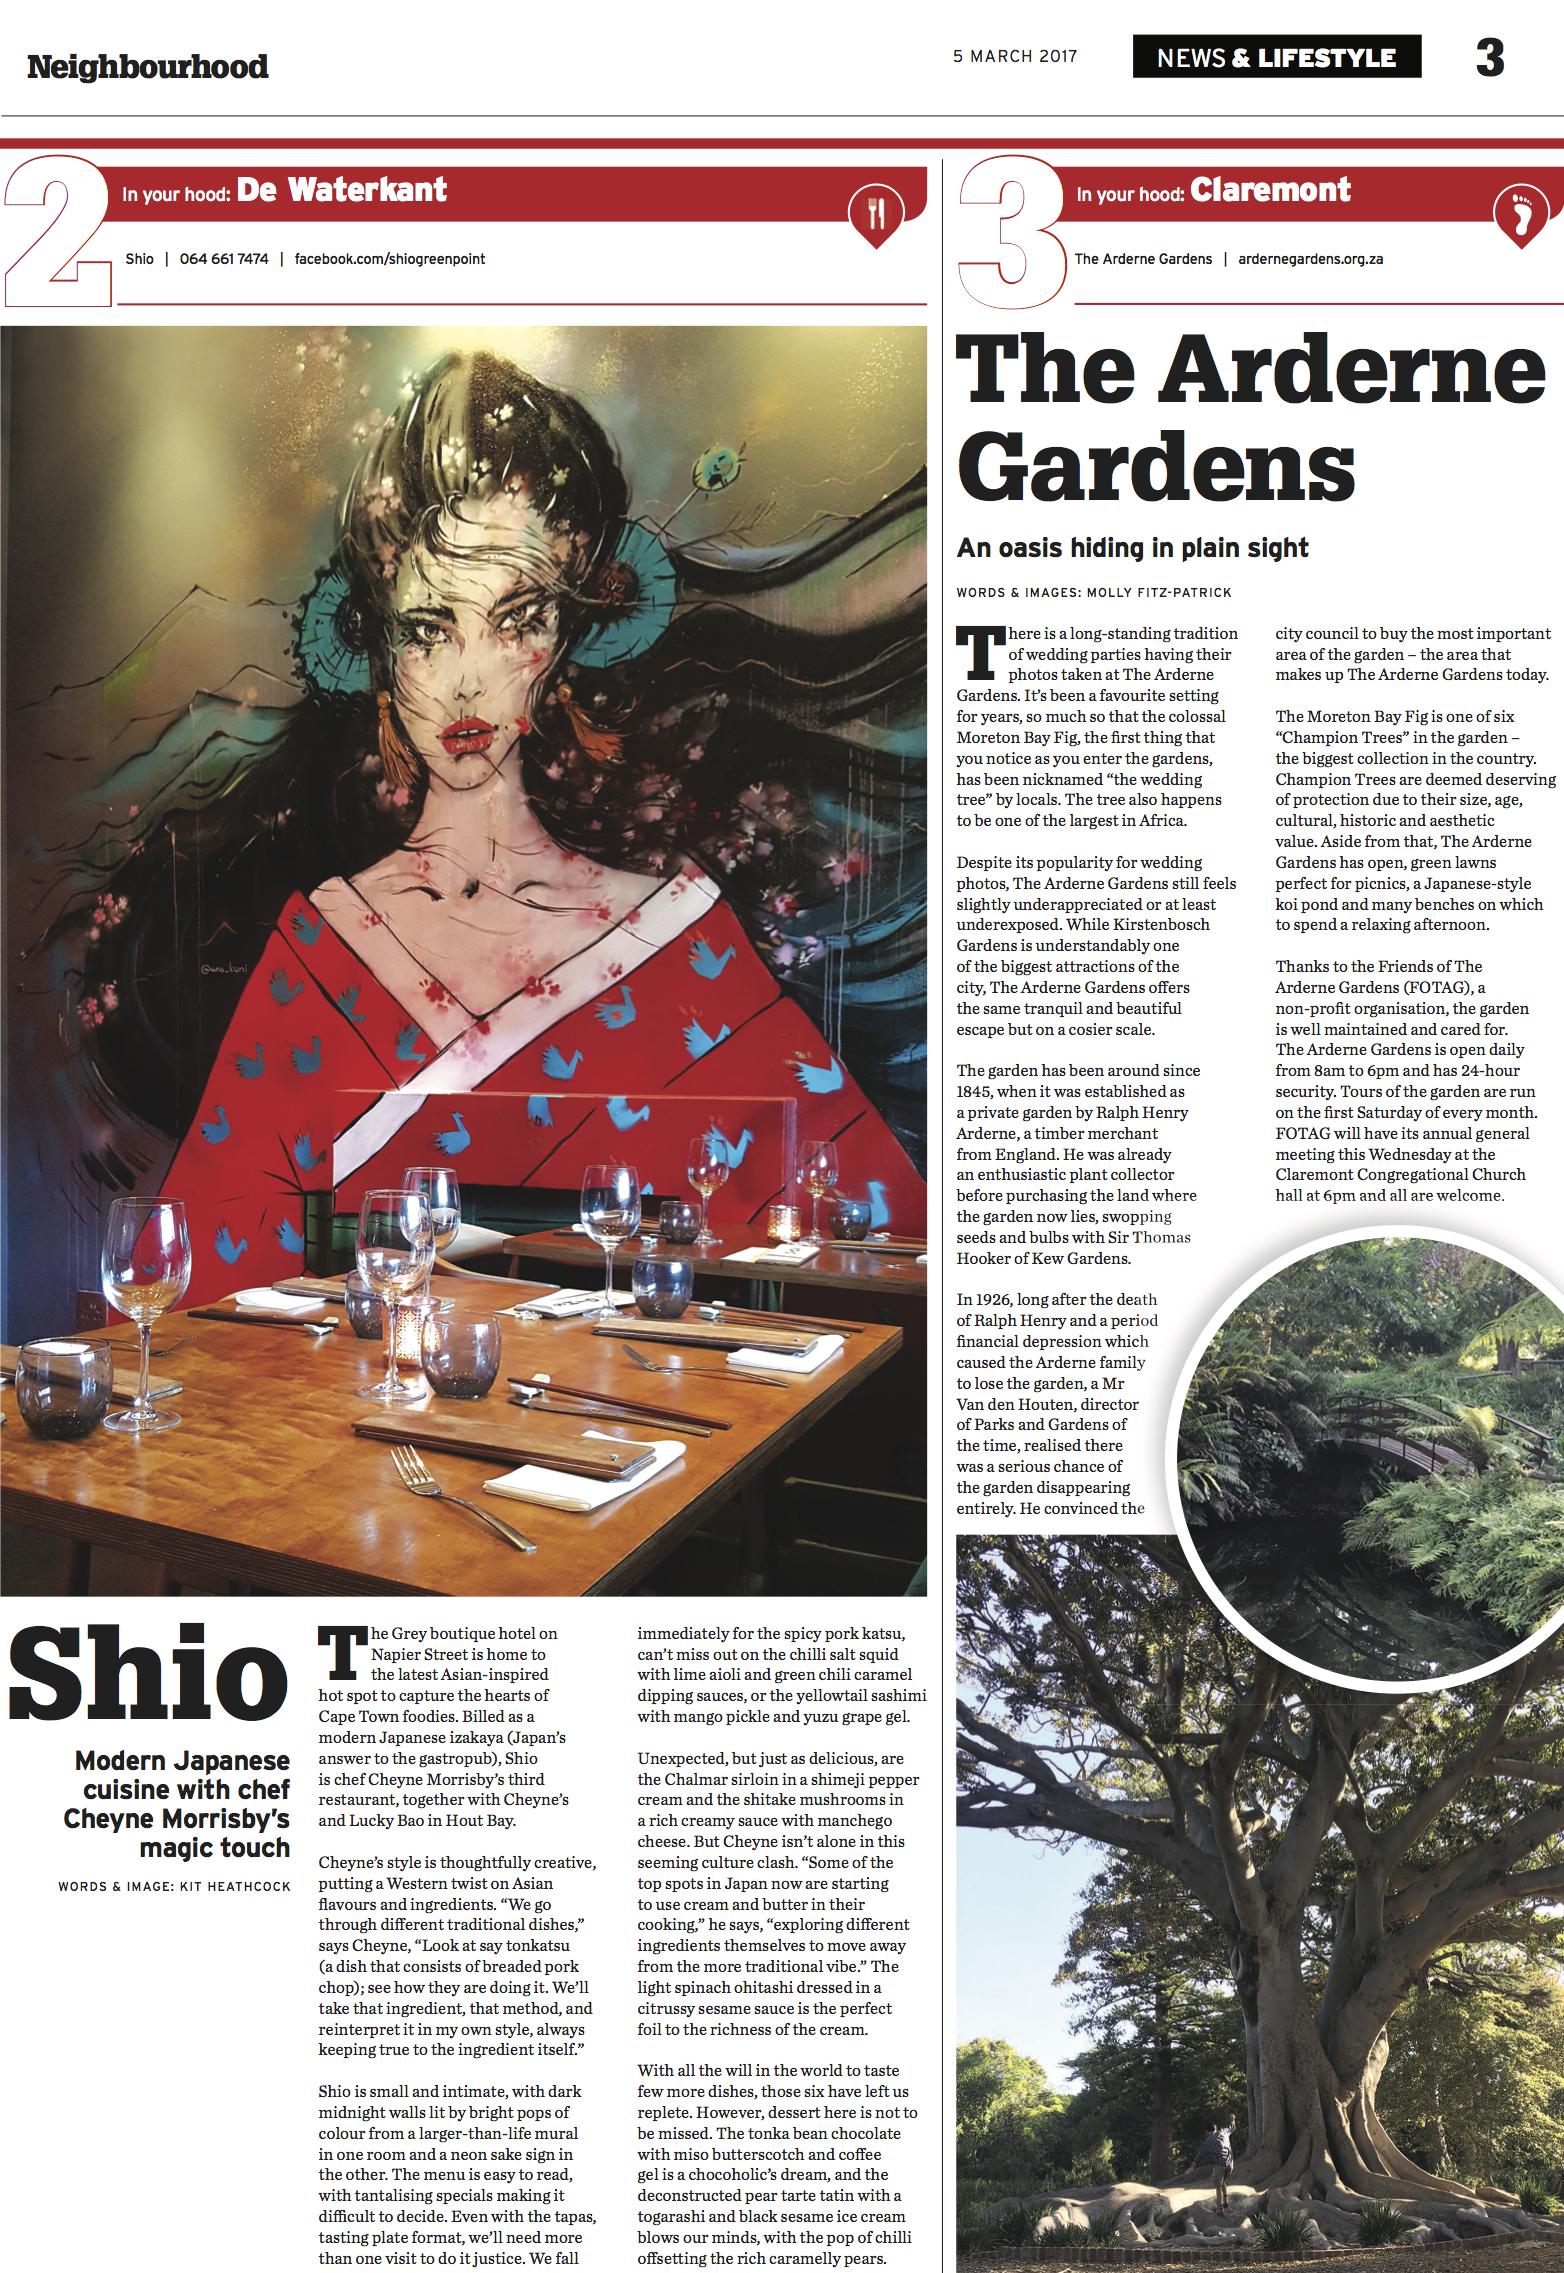 Sunday Times Neighbourhood_0503_Arderne Gardens.jpg